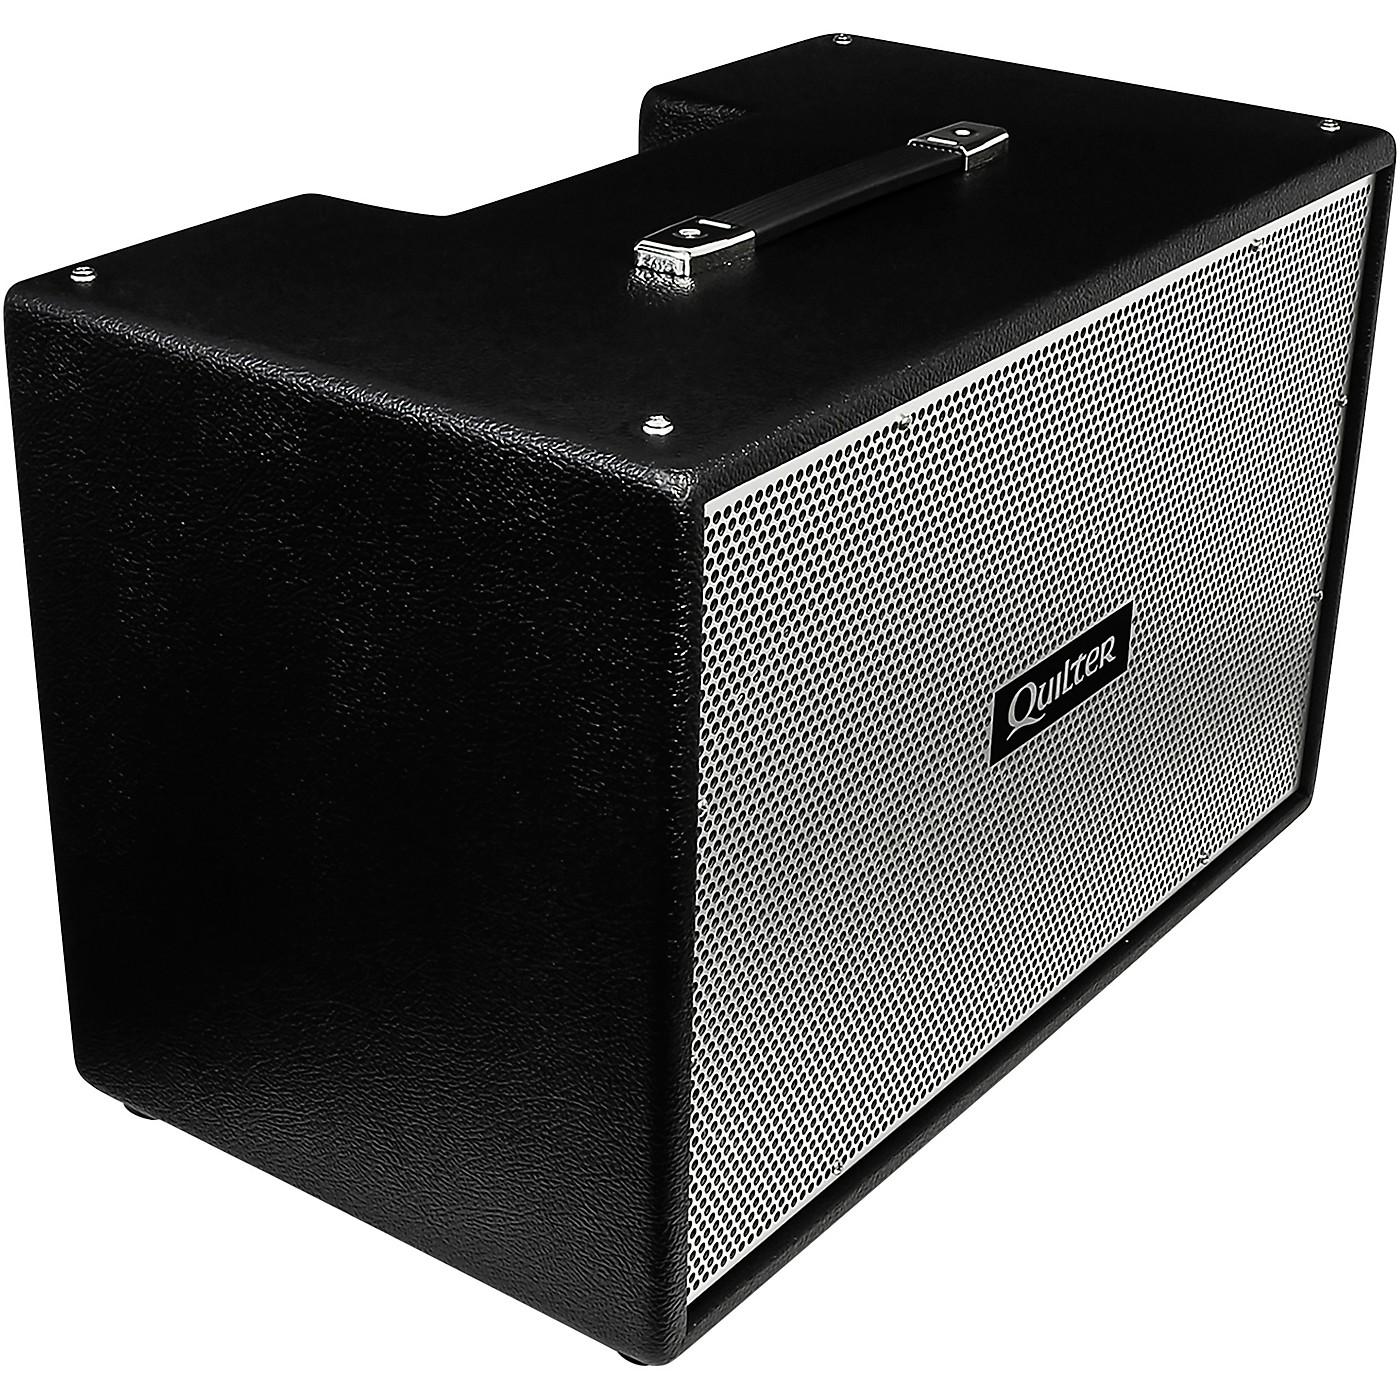 Quilter Labs Bassliner 1x12C Modular Speaker System thumbnail